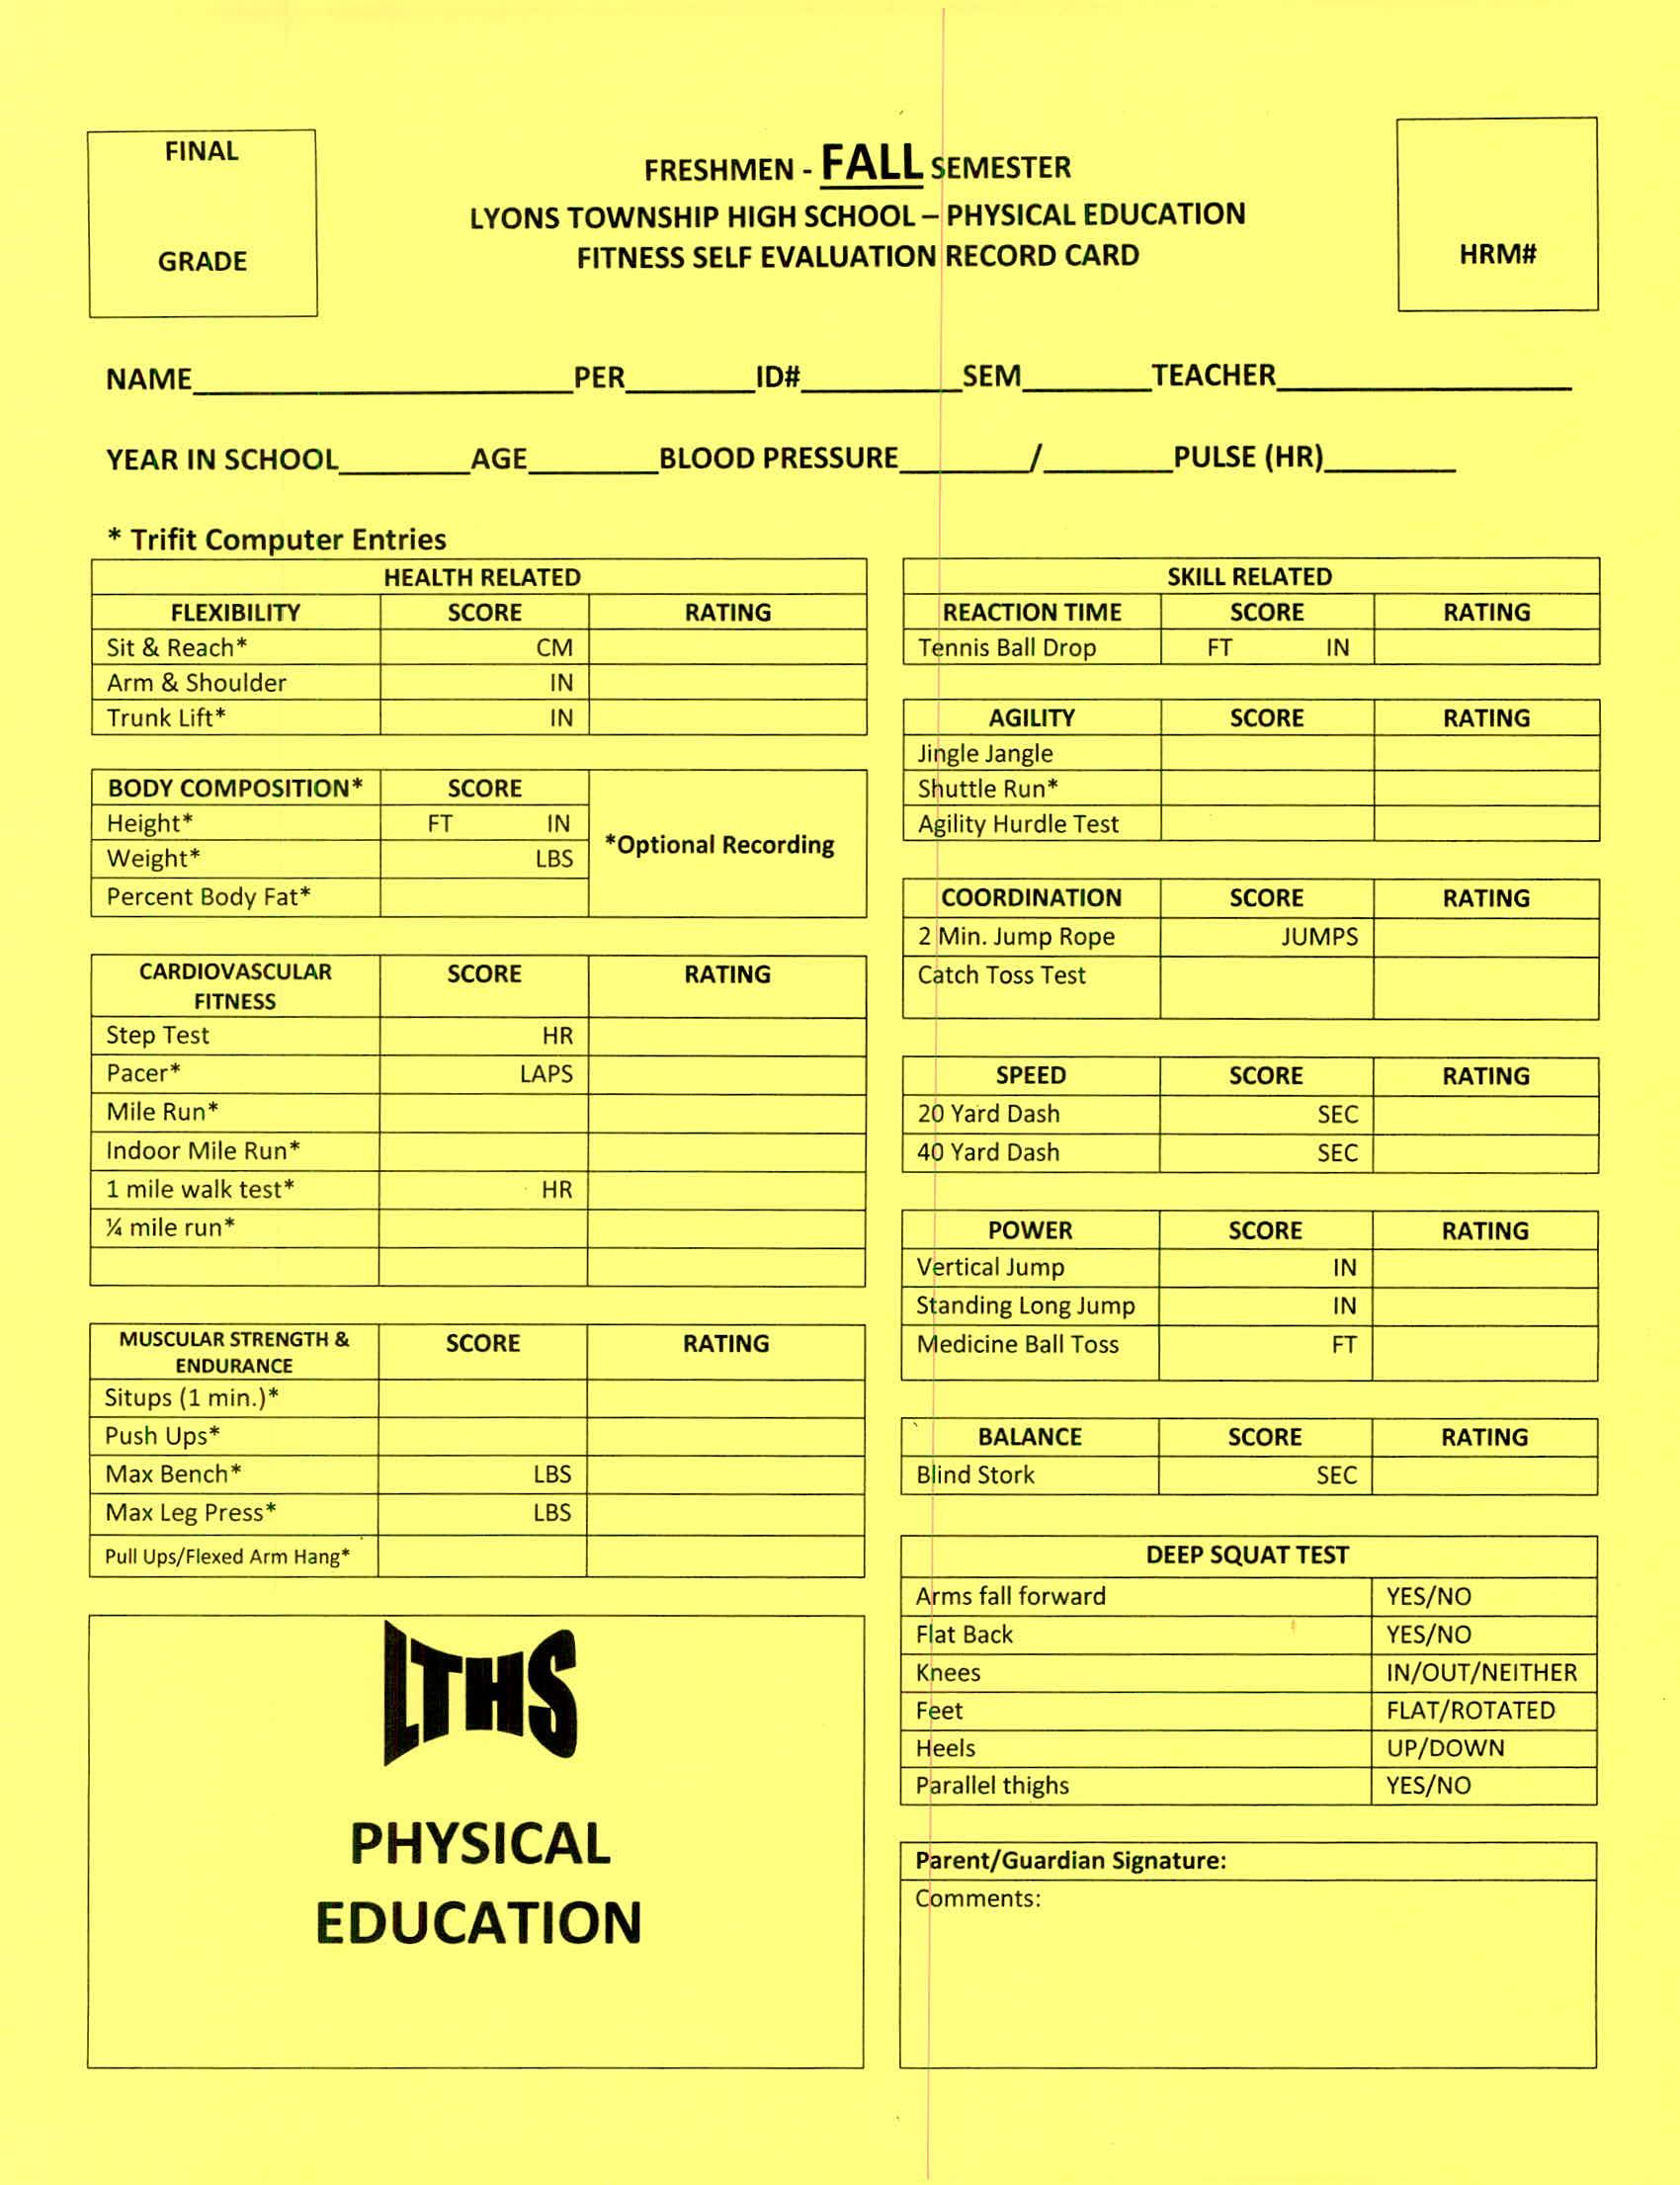 Bryan Bergman Freshmen Physical Education